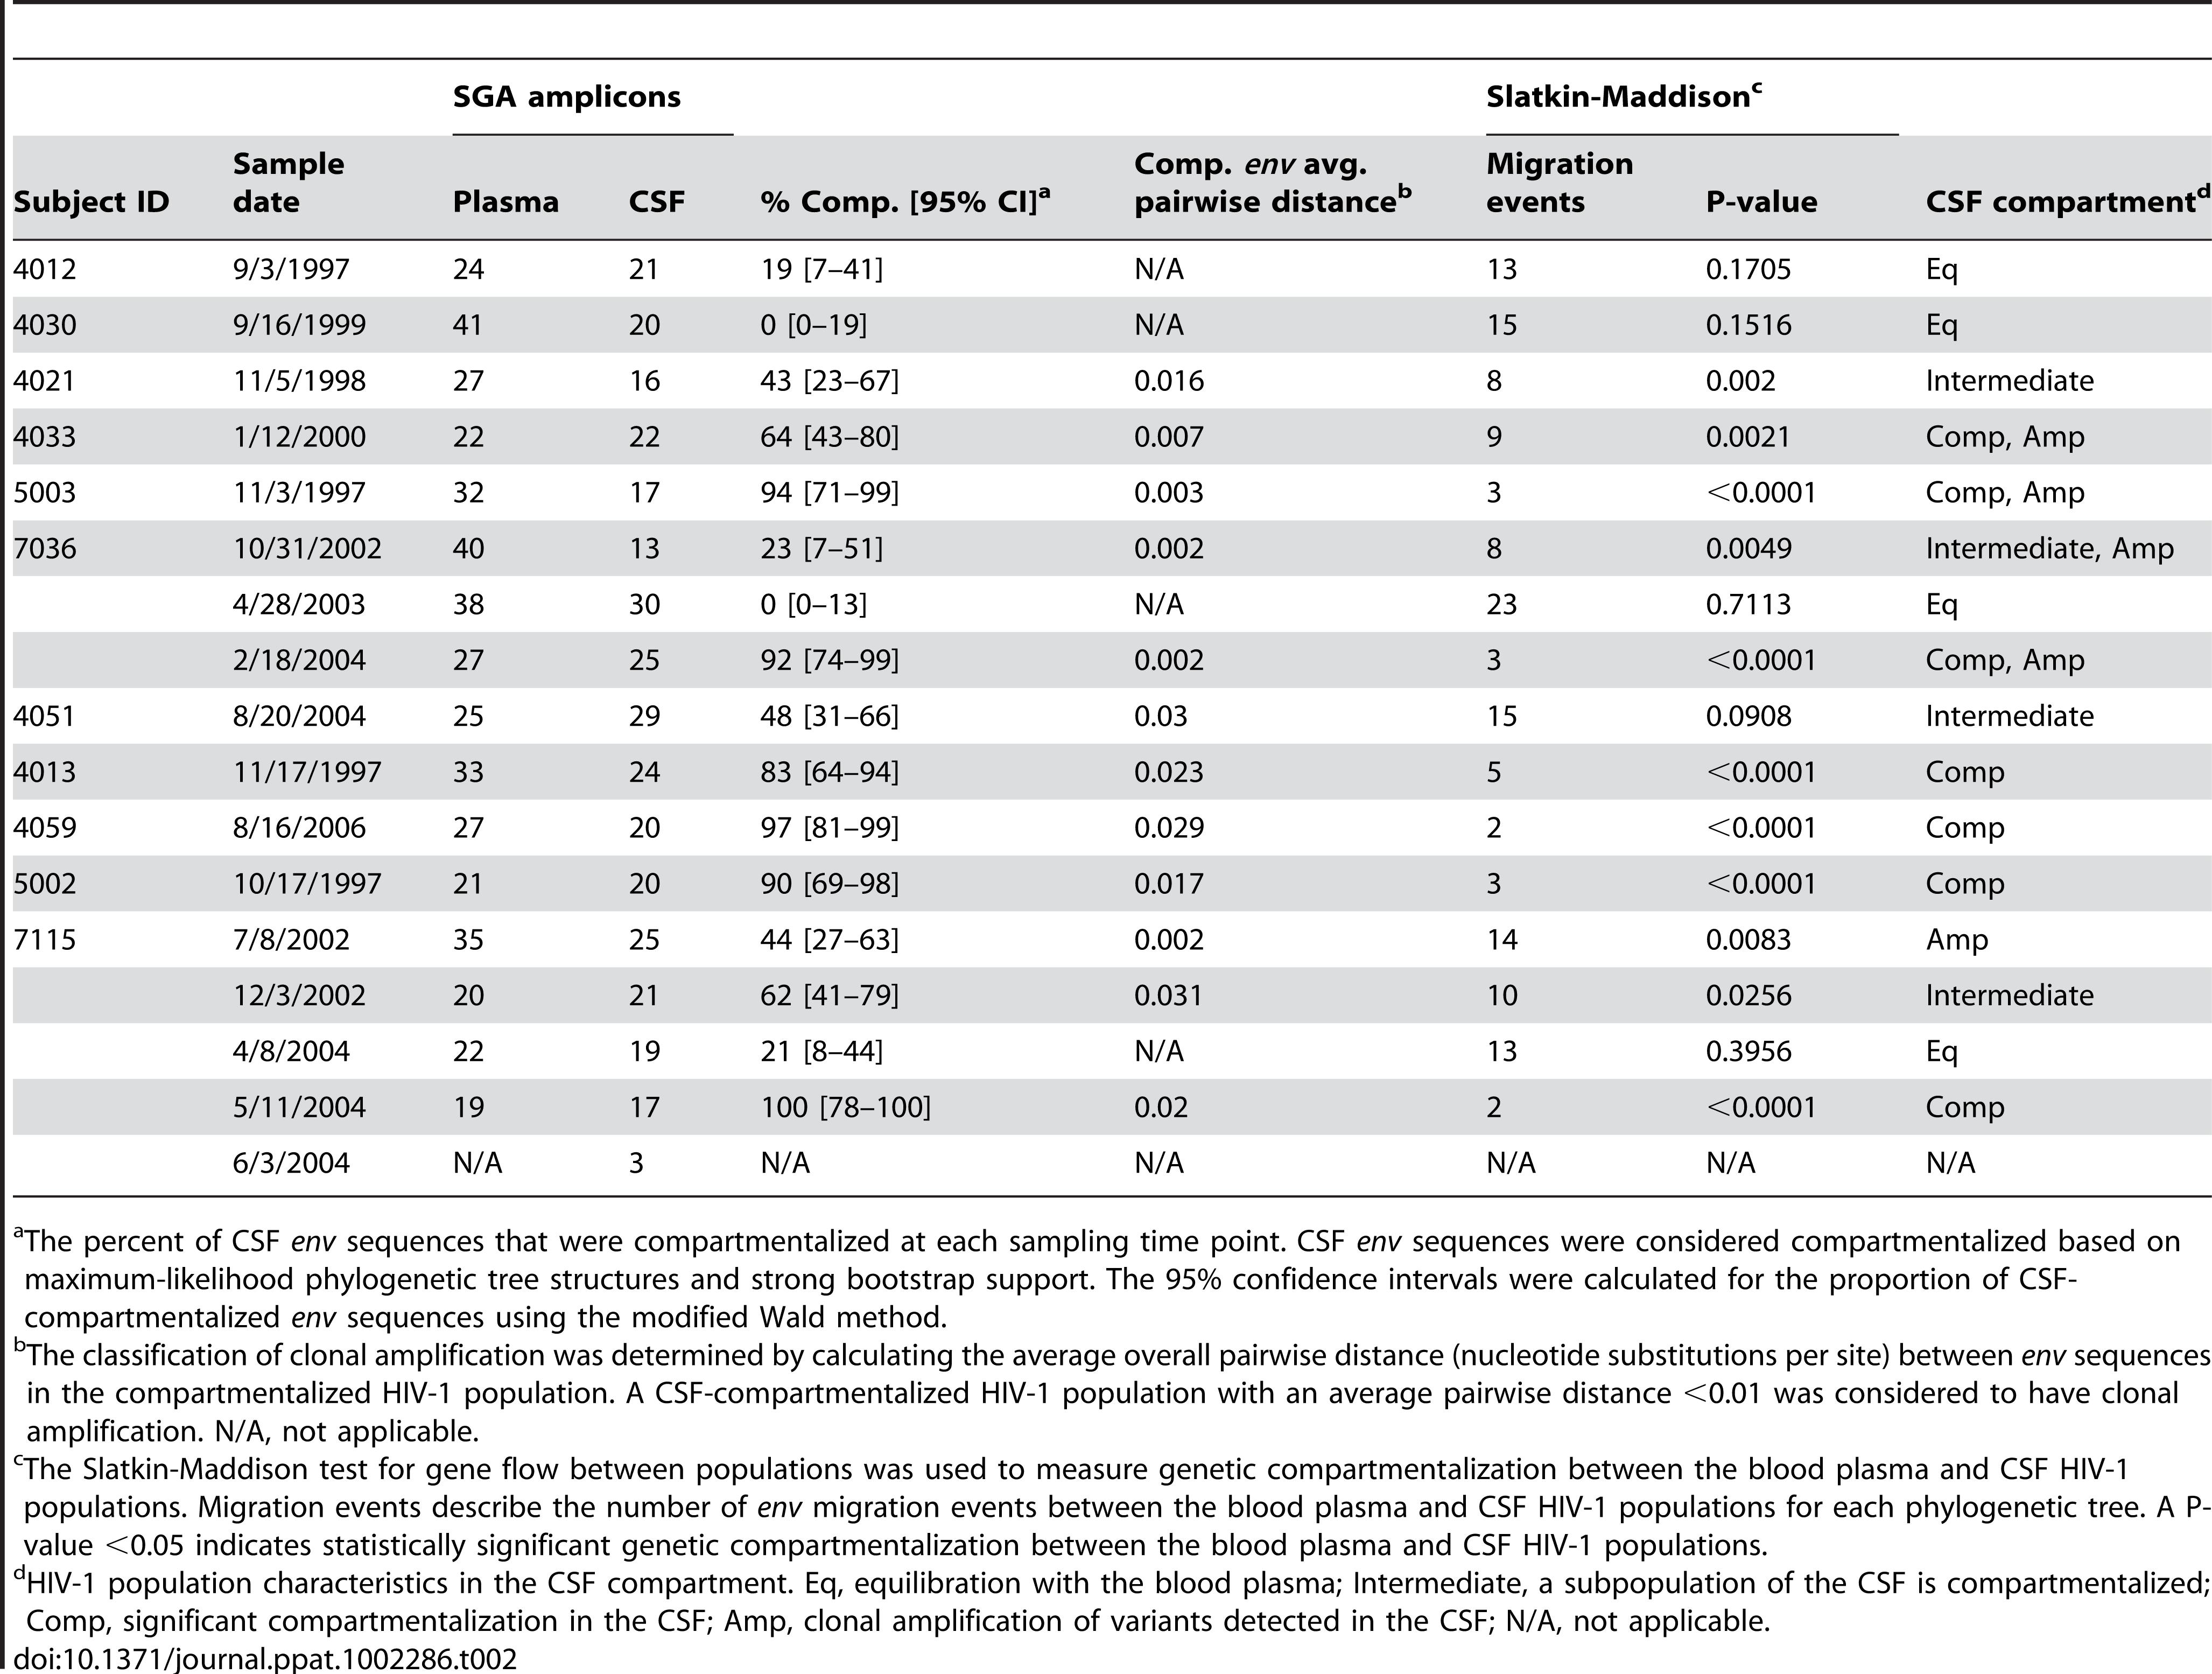 HIV-1 population characteristics in the CSF compartment.